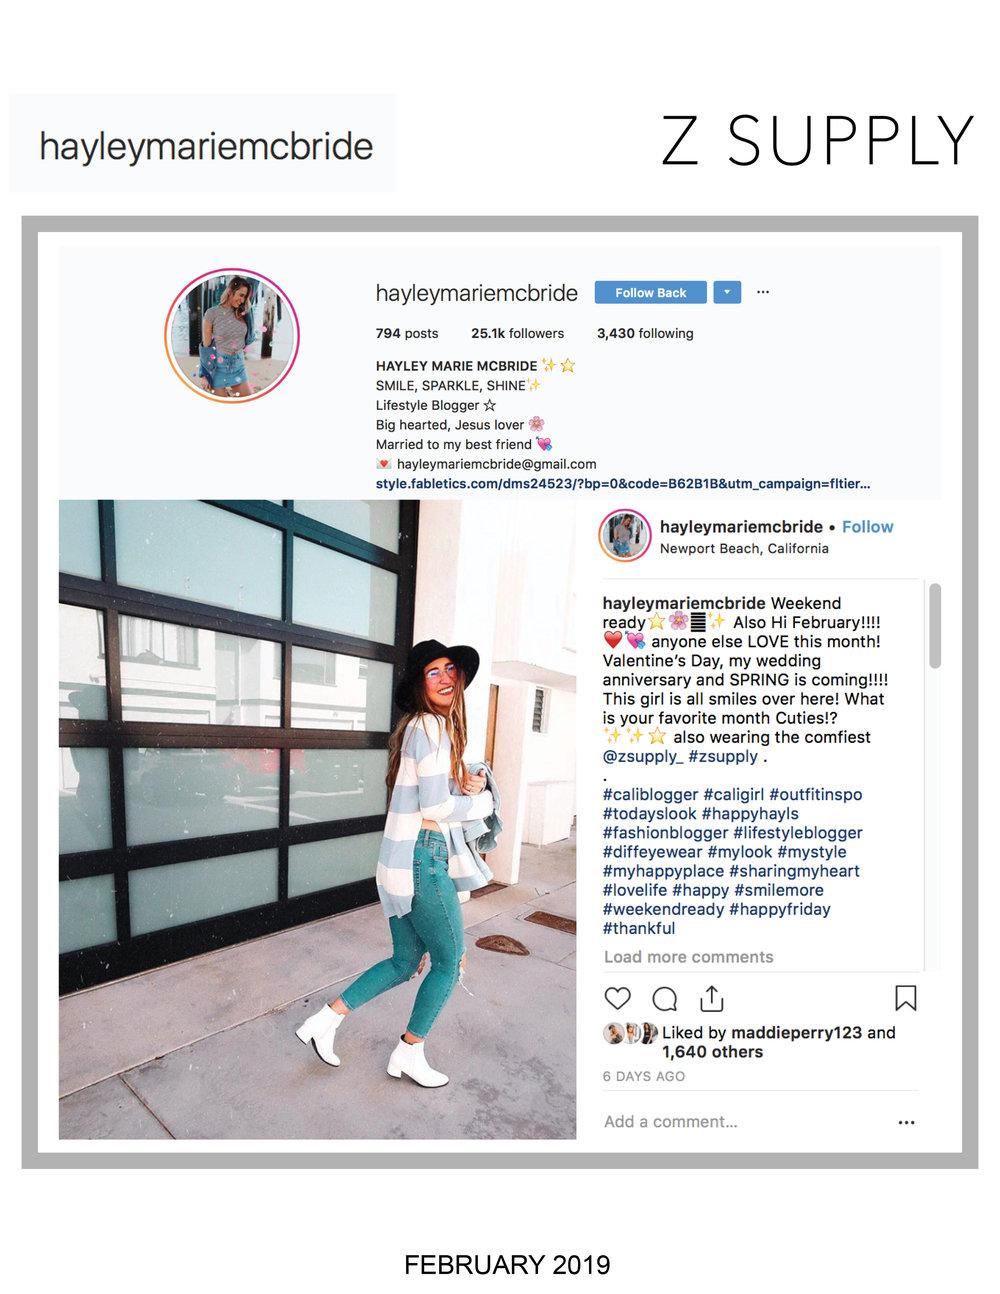 Zsupply_HayleyMcbride_February2019.jpg